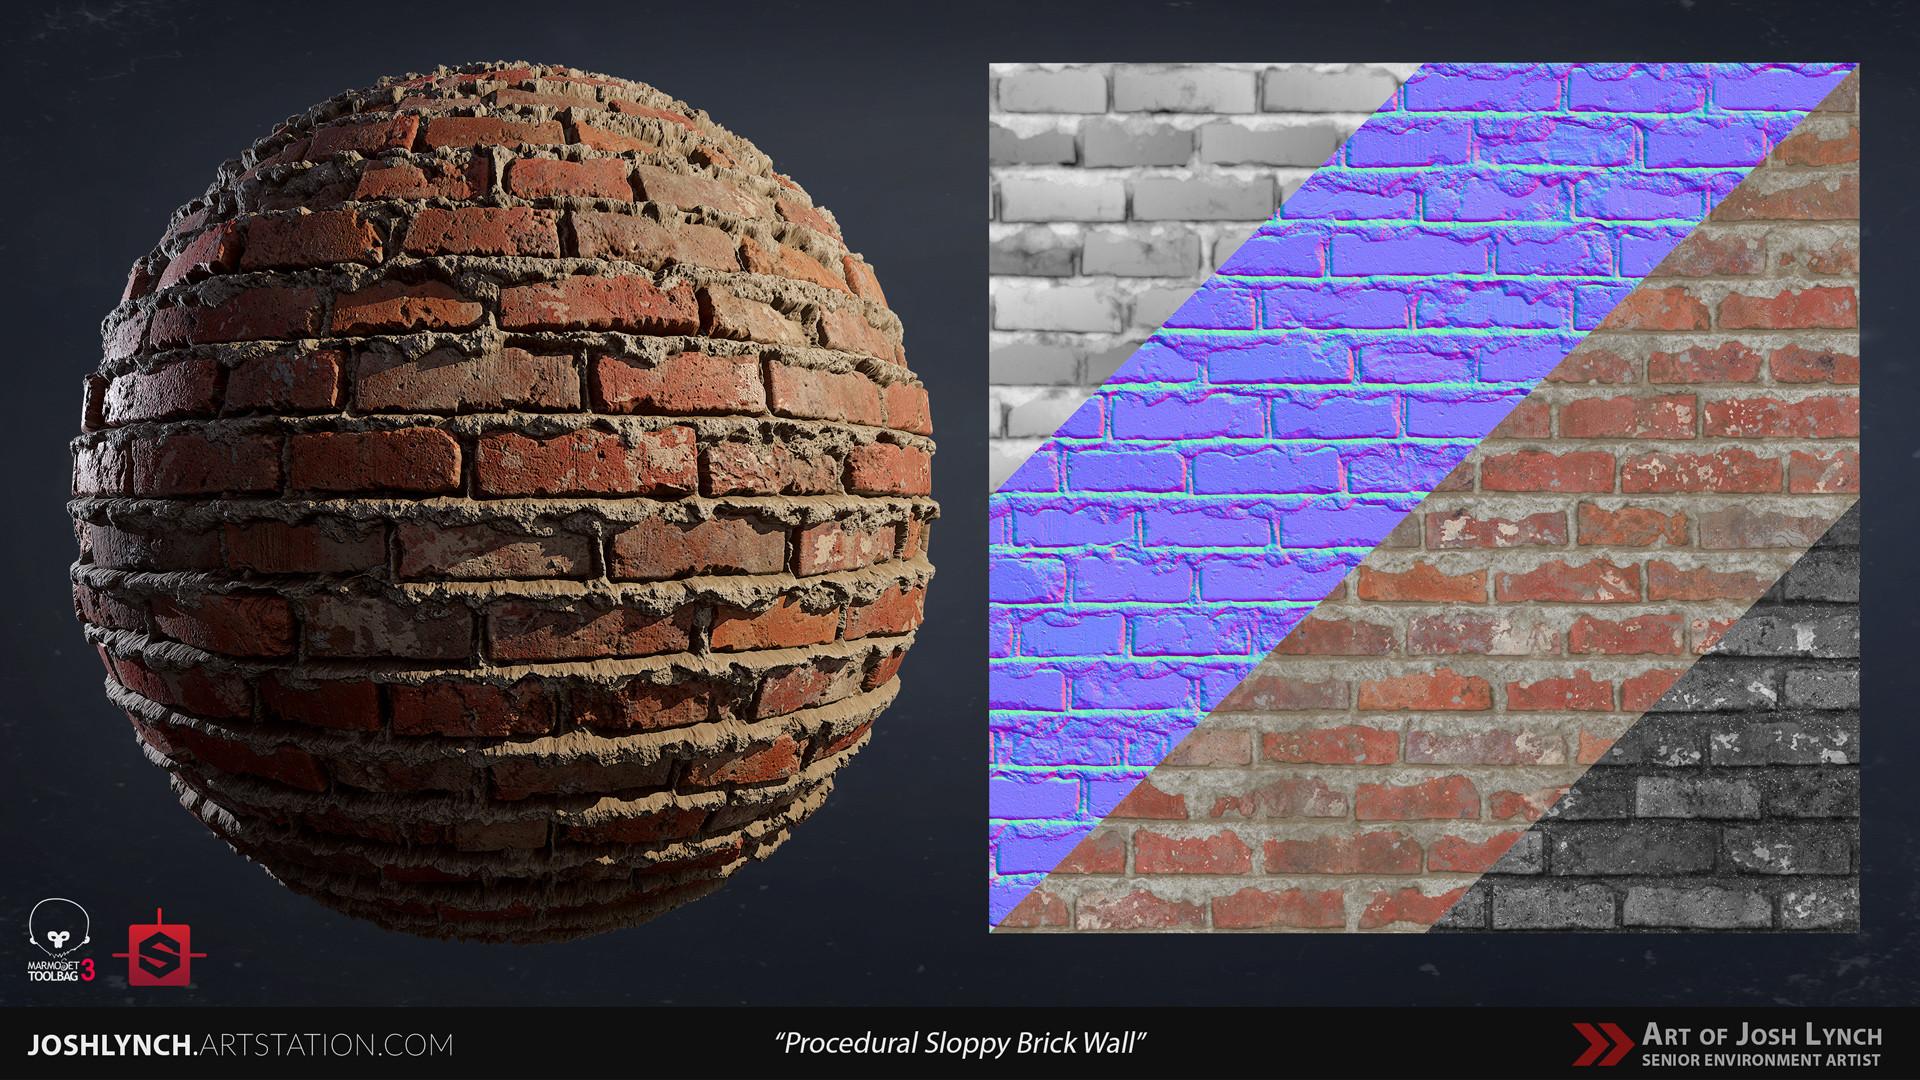 Joshua lynch wall brick sloppy 02 comp sphere 02